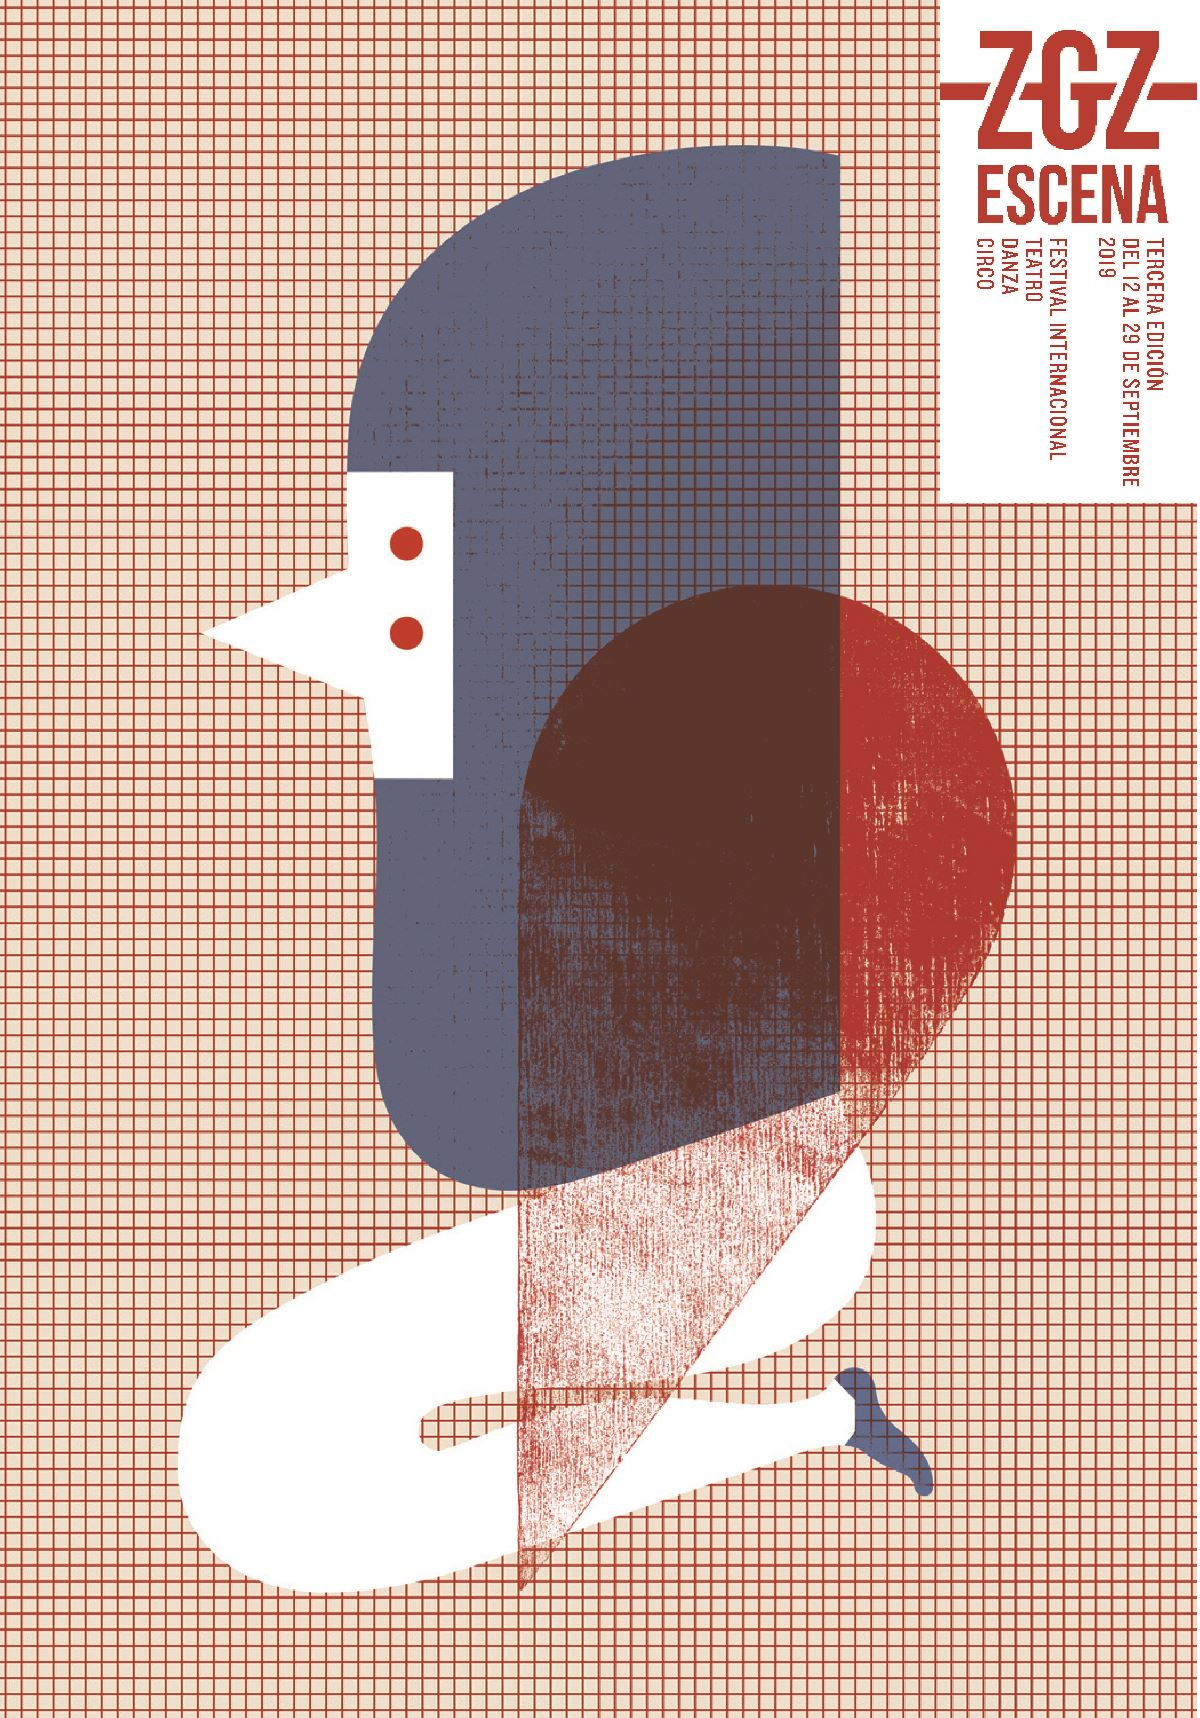 DESCARGAR 3 imágemes 2019.. Diseño Isidro Ferrer.